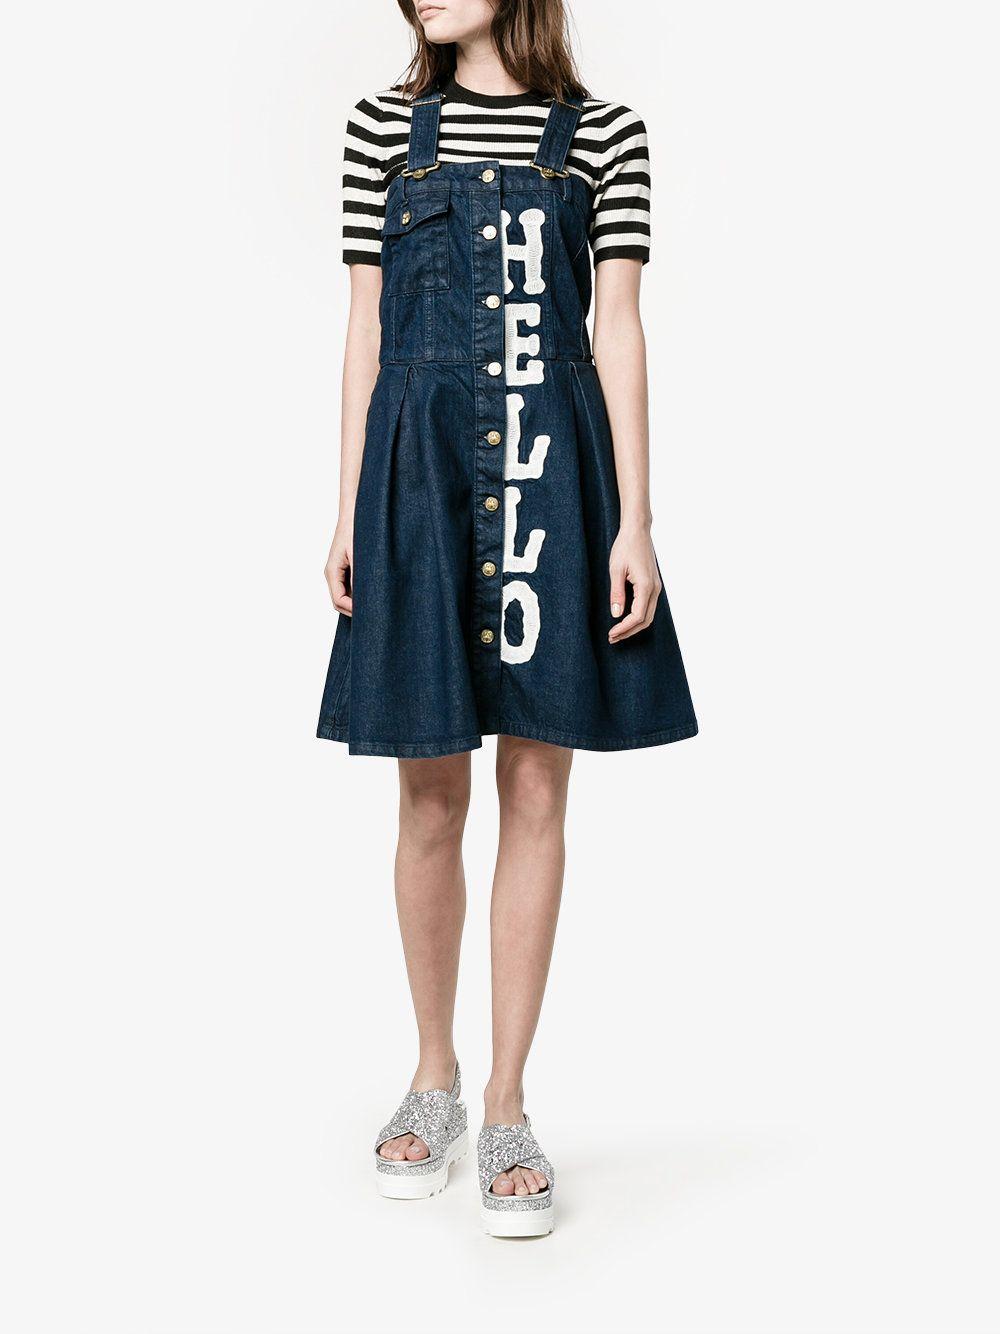 House Of Holland denim dungaree dress